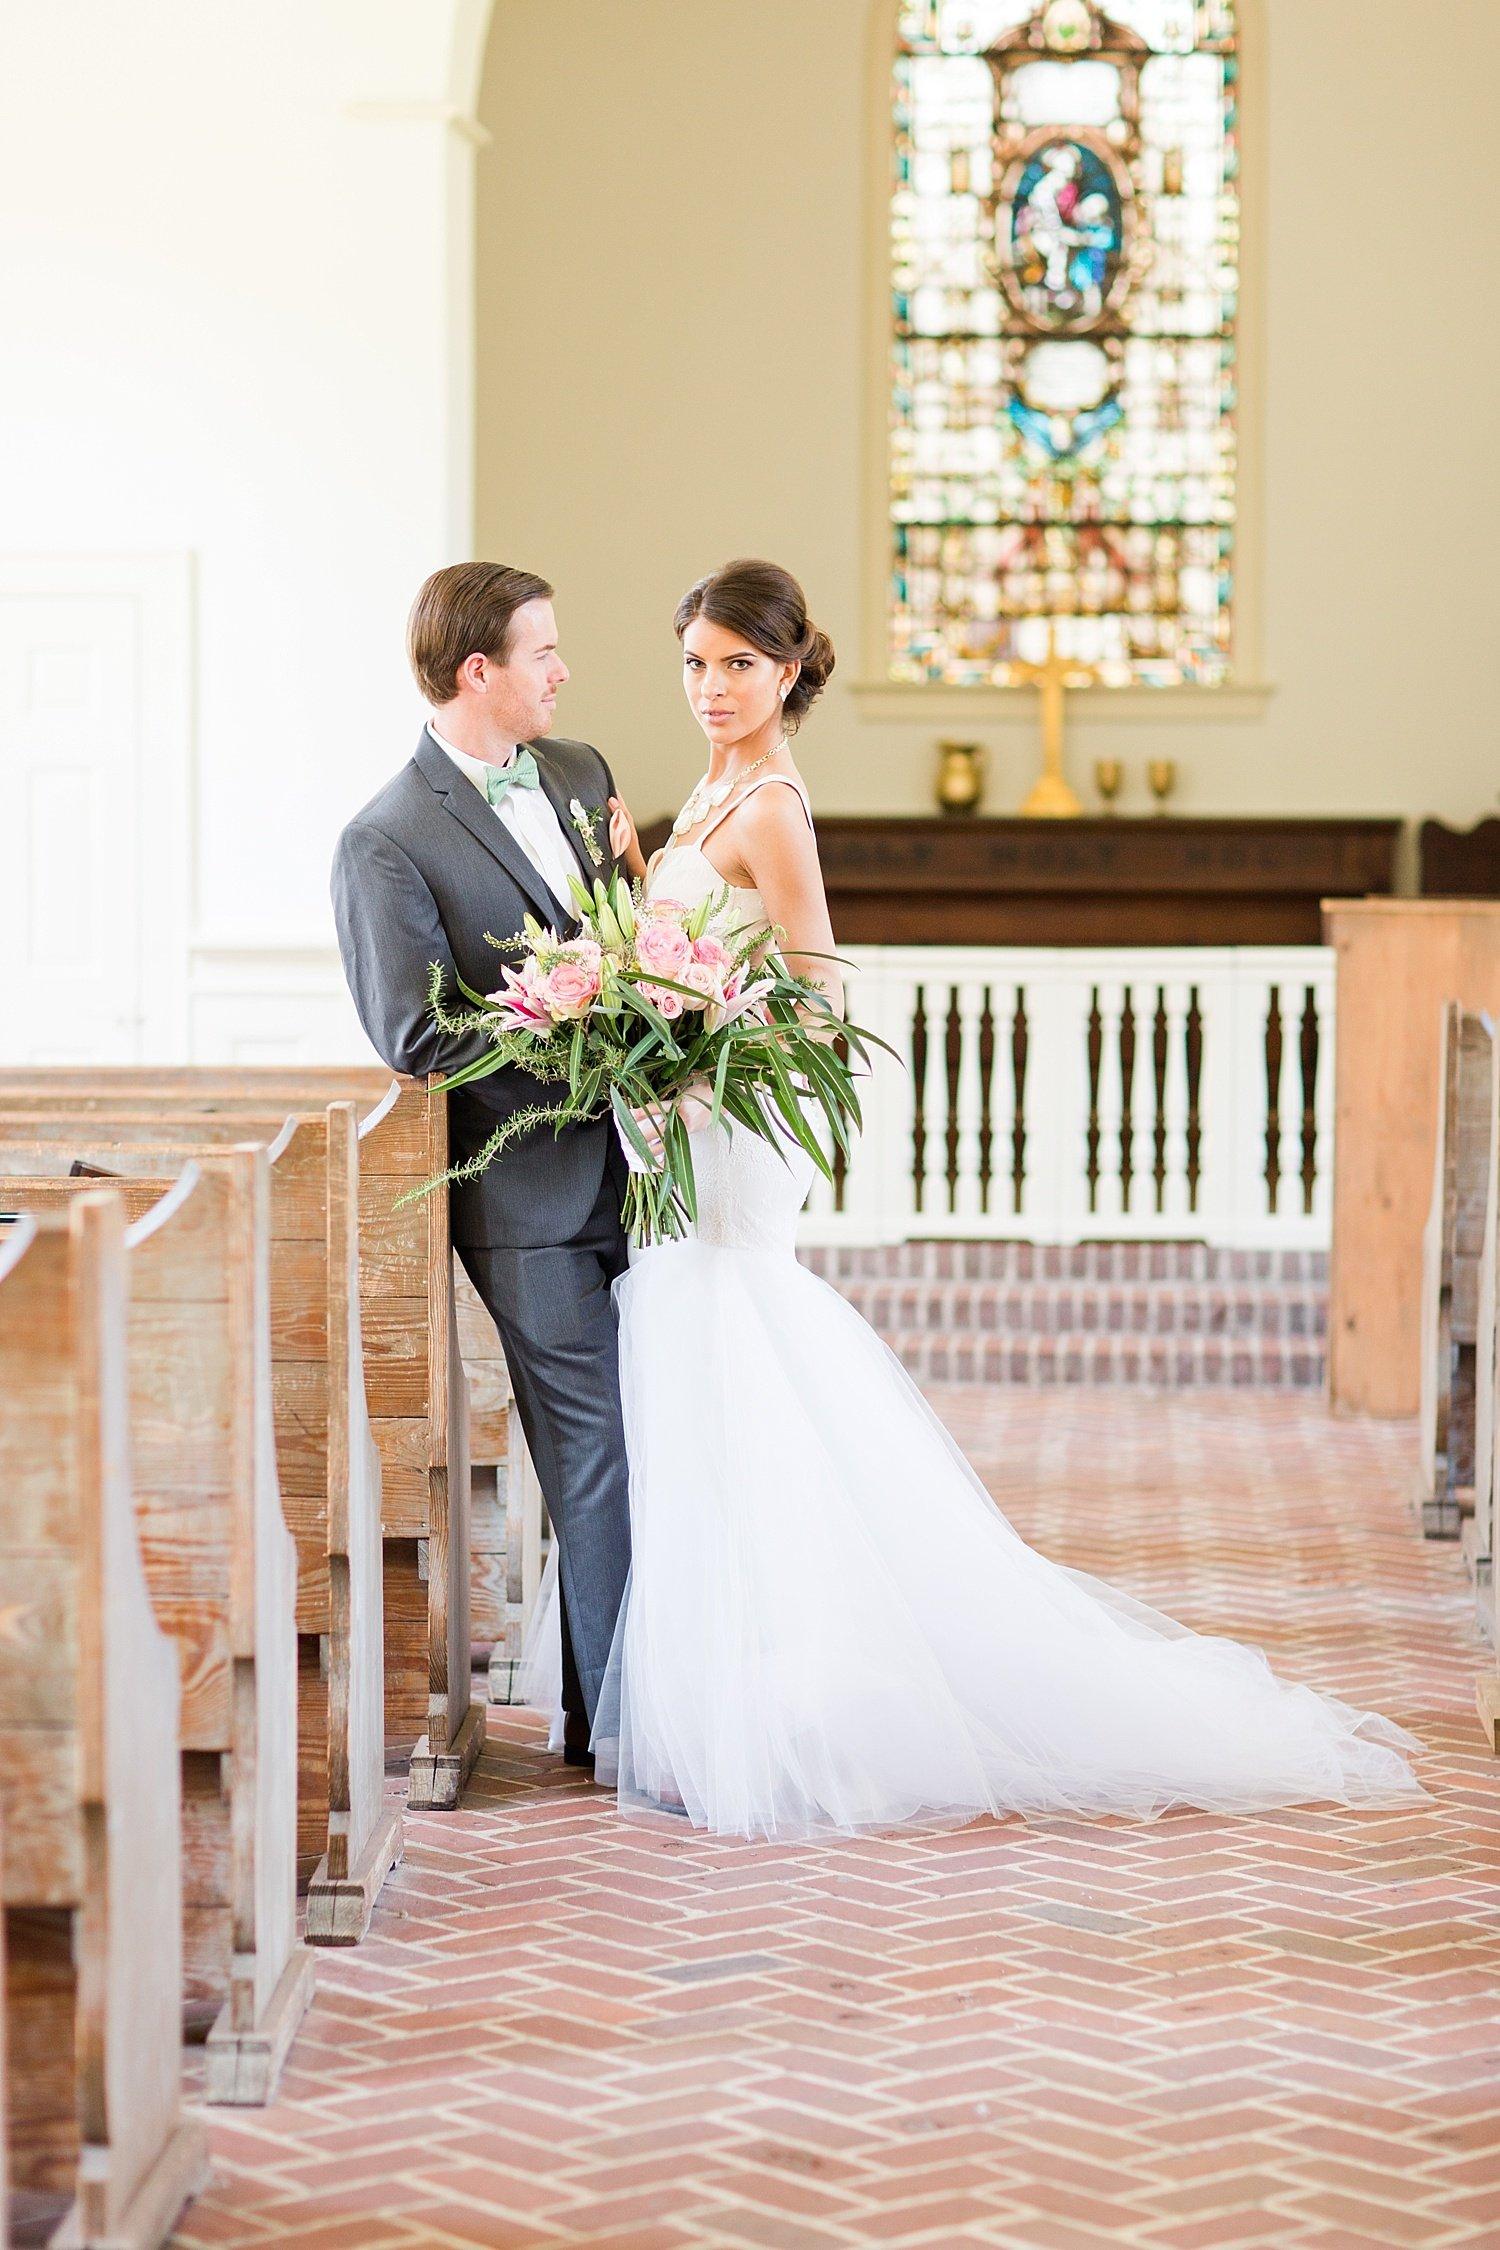 rachel-strickland-photography-katie-may-ivory-and-beau-bridal-boutique-bethesda-academy-wedding-whitfield-chapel-wedding-savannah-bridal-boutique-savannah-weddings-savannah-wedding-savannah-wedding-planner-savannah-bridal-gowns-savannah-bride-8.jpg